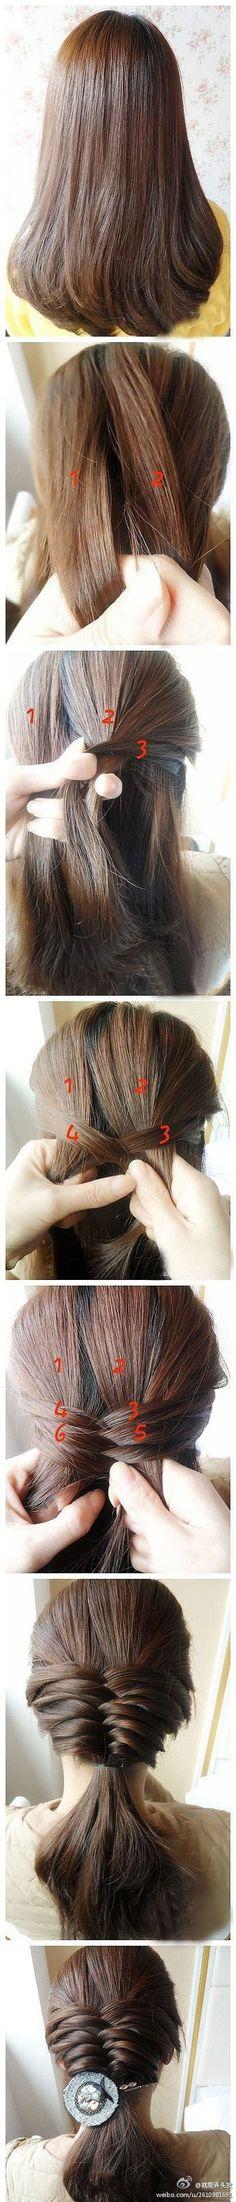 French fishtail braid.